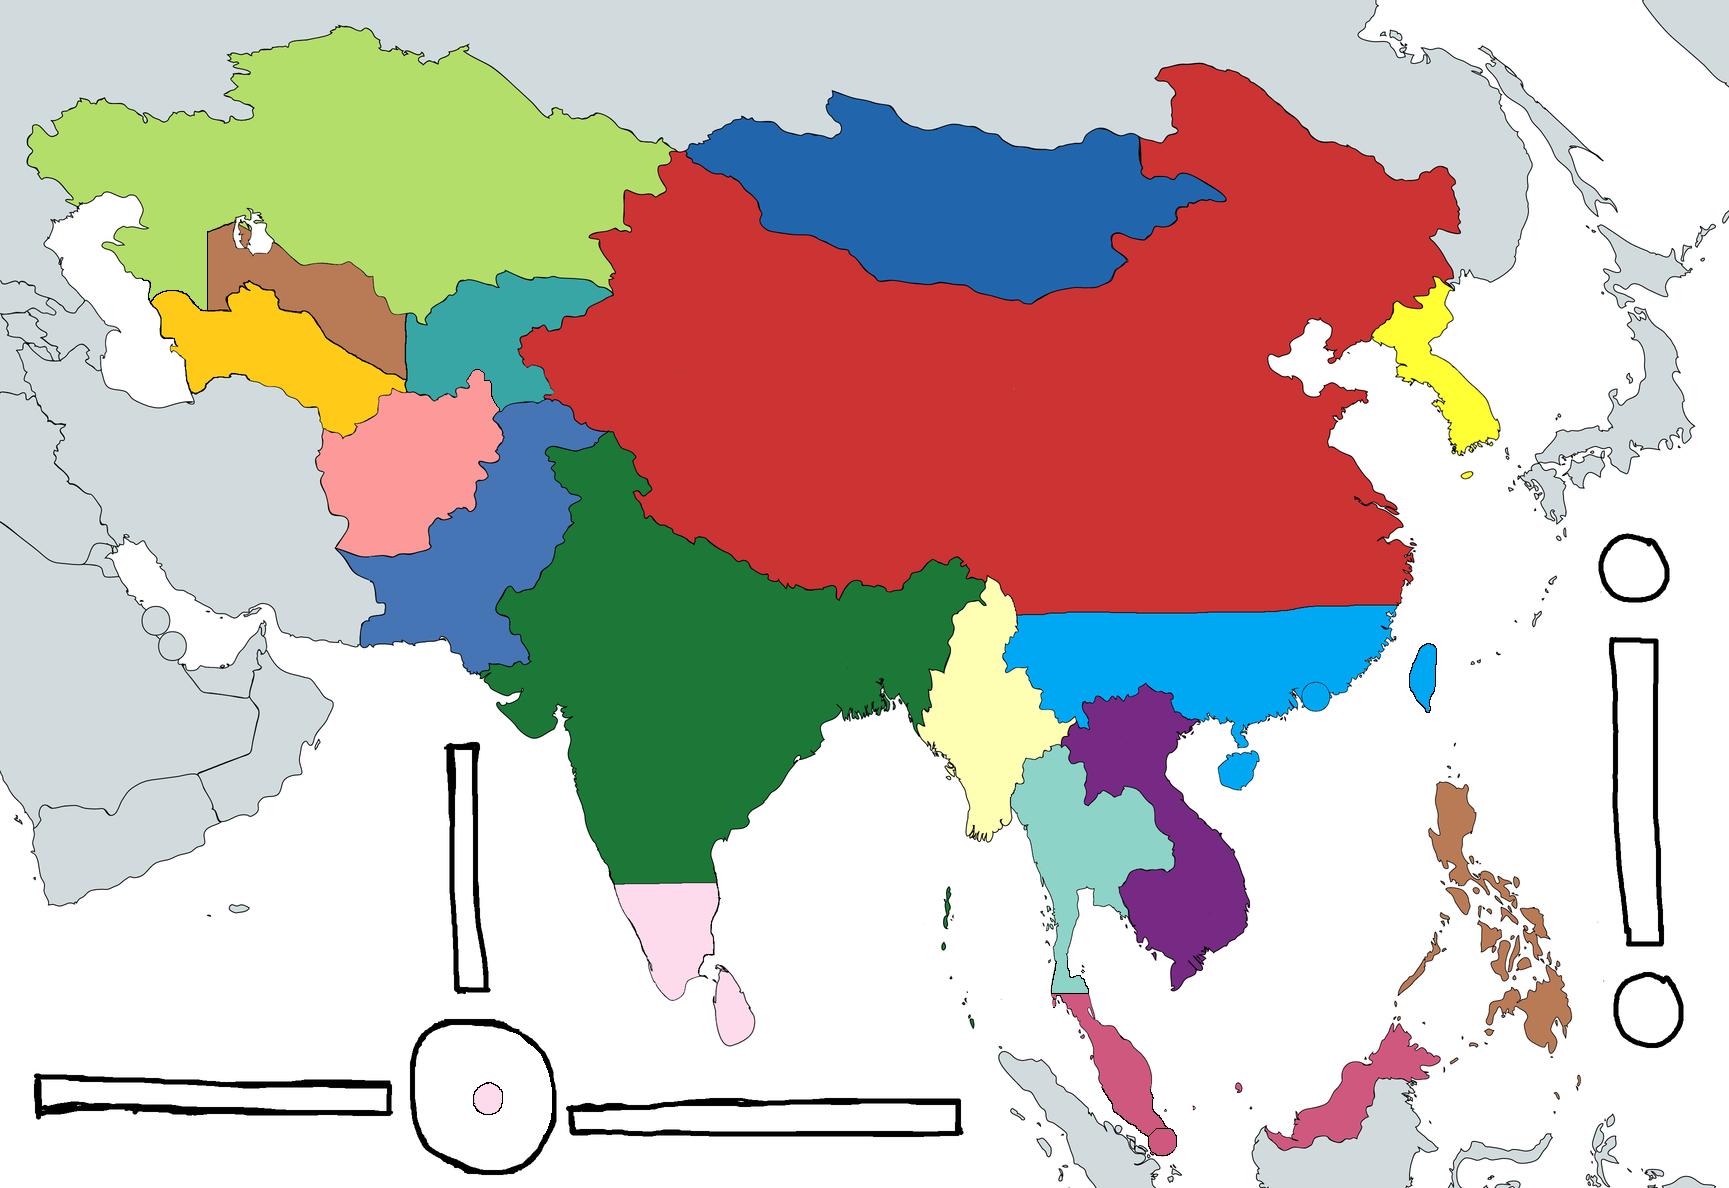 MapChart_Map_1_501.png